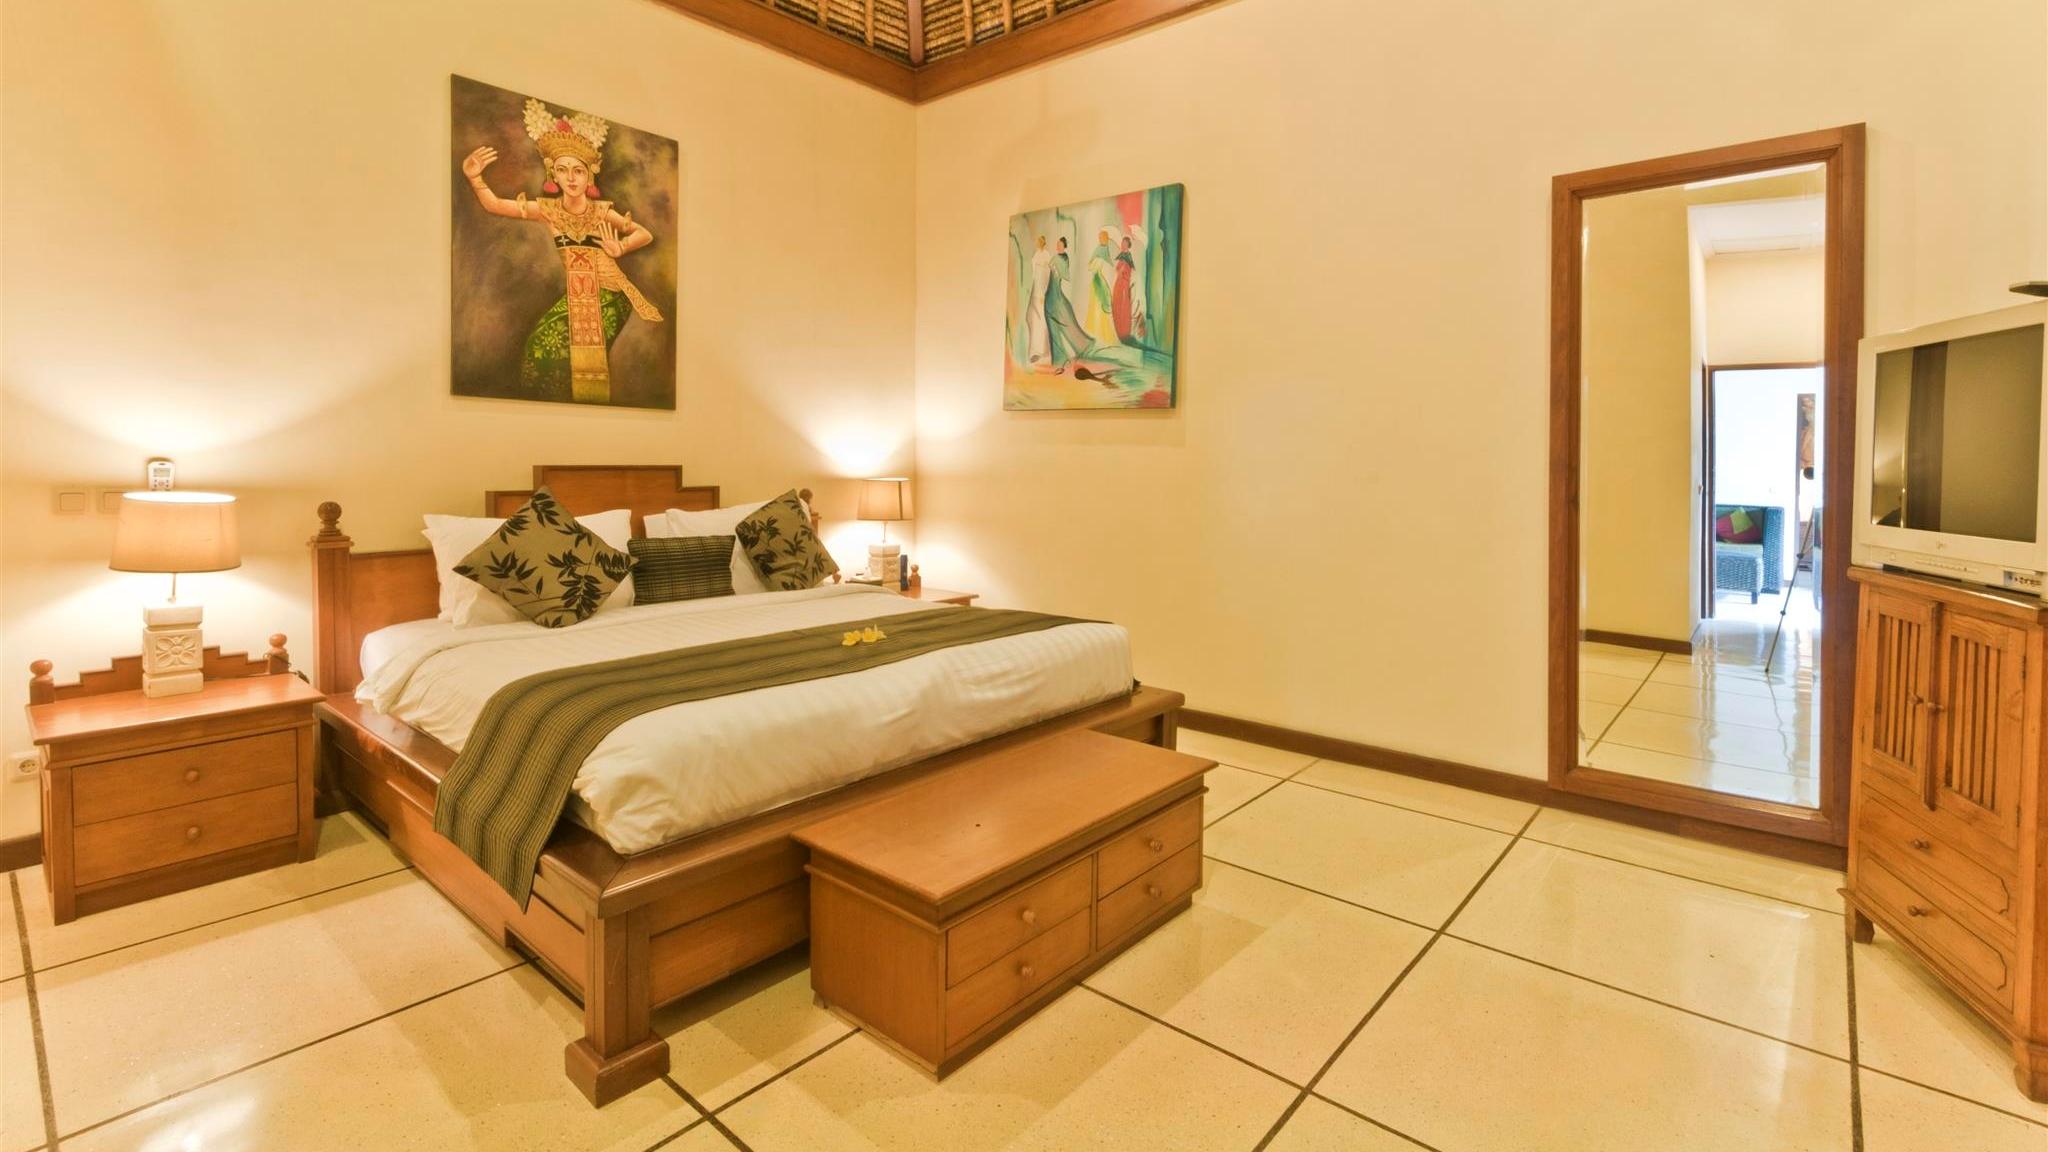 Bedroom with TV - Villa Krisna - Seminyak, Bali